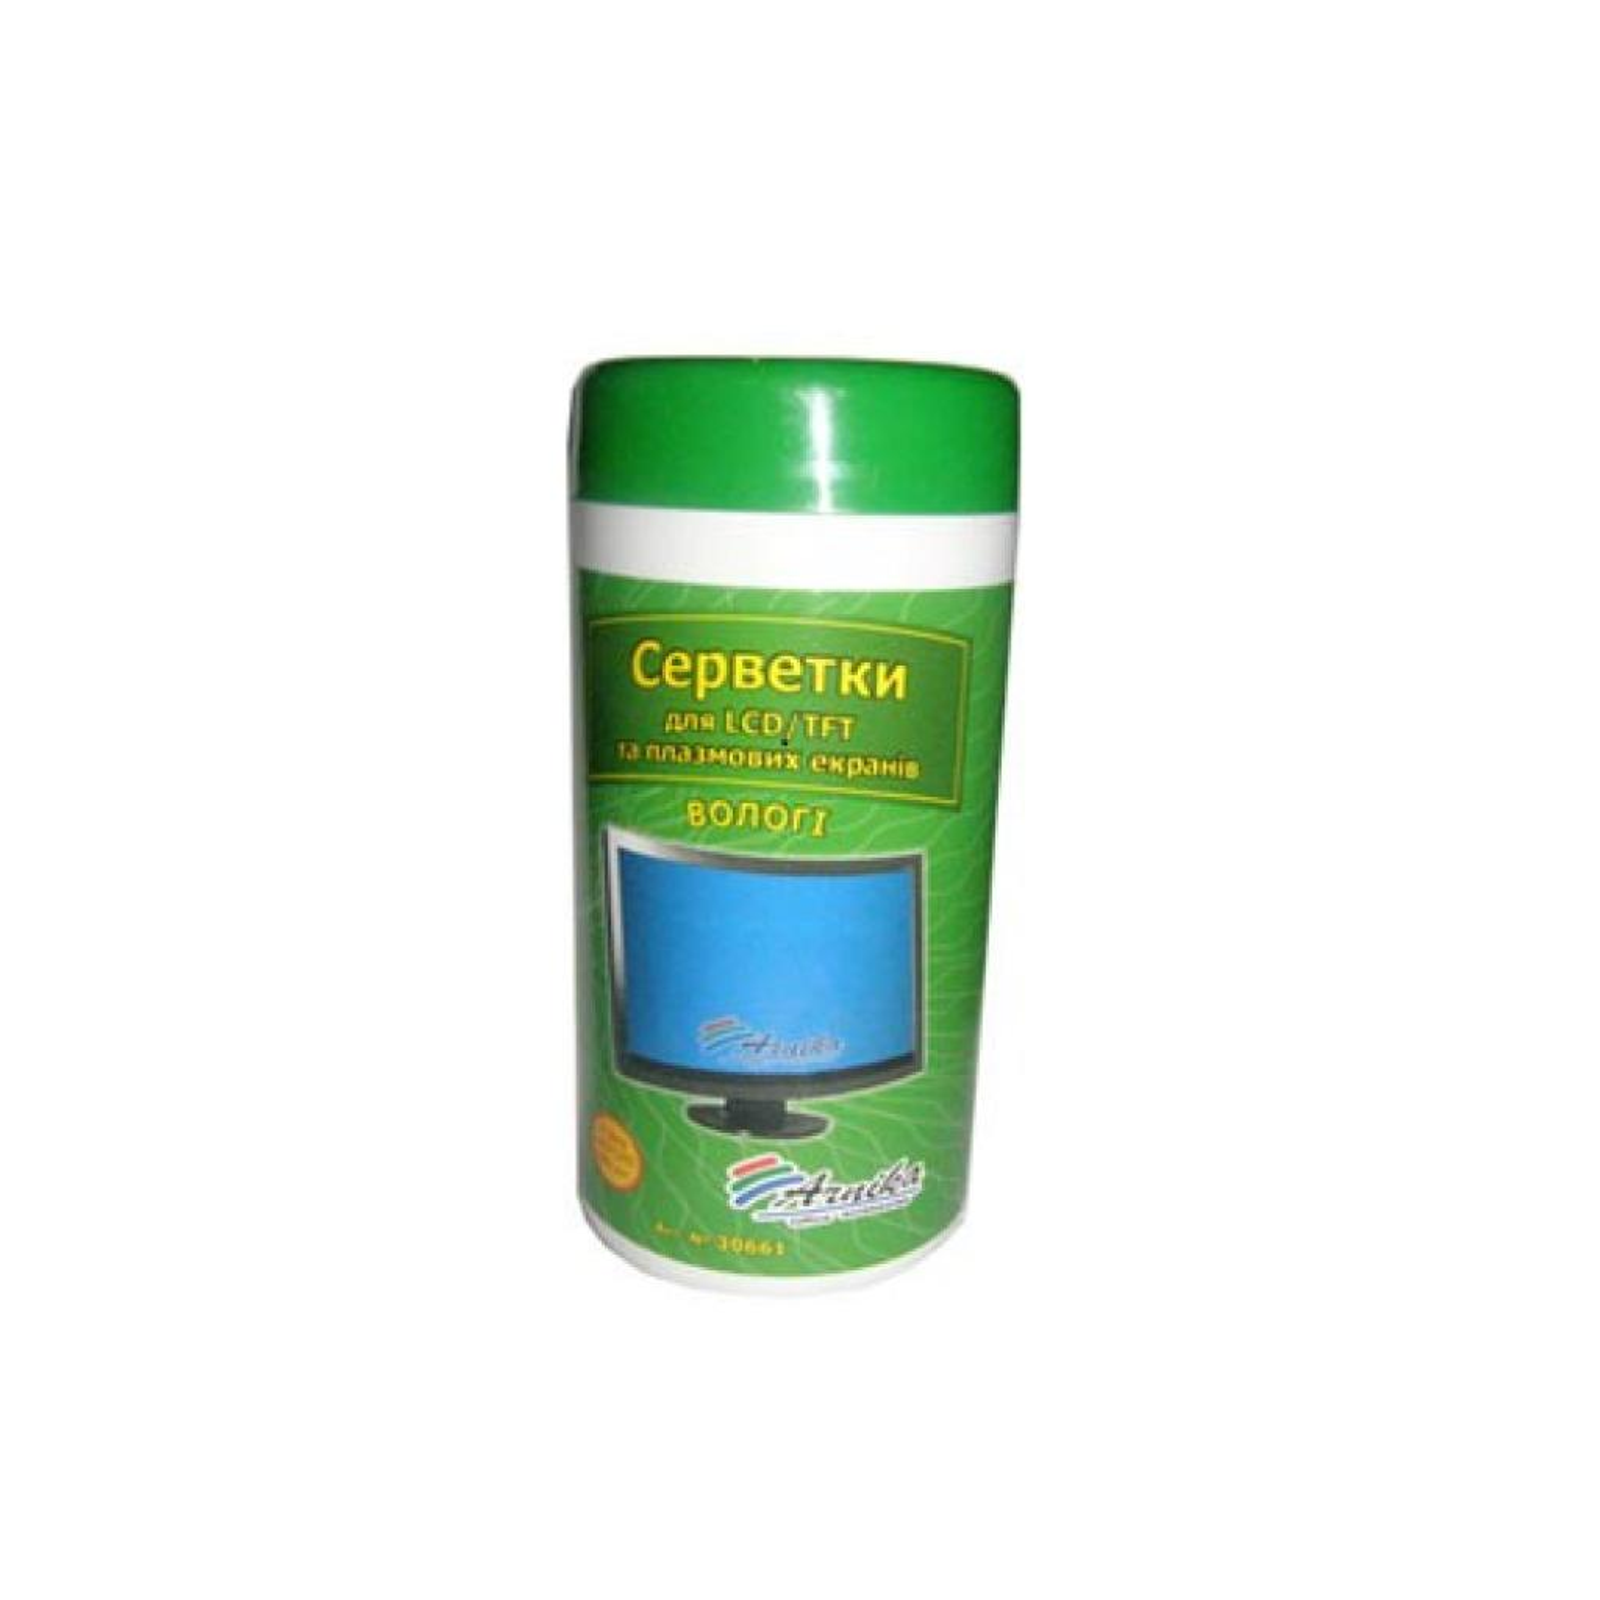 Салфетки for LCD/TFT tub-100pcs Arnika (30661)